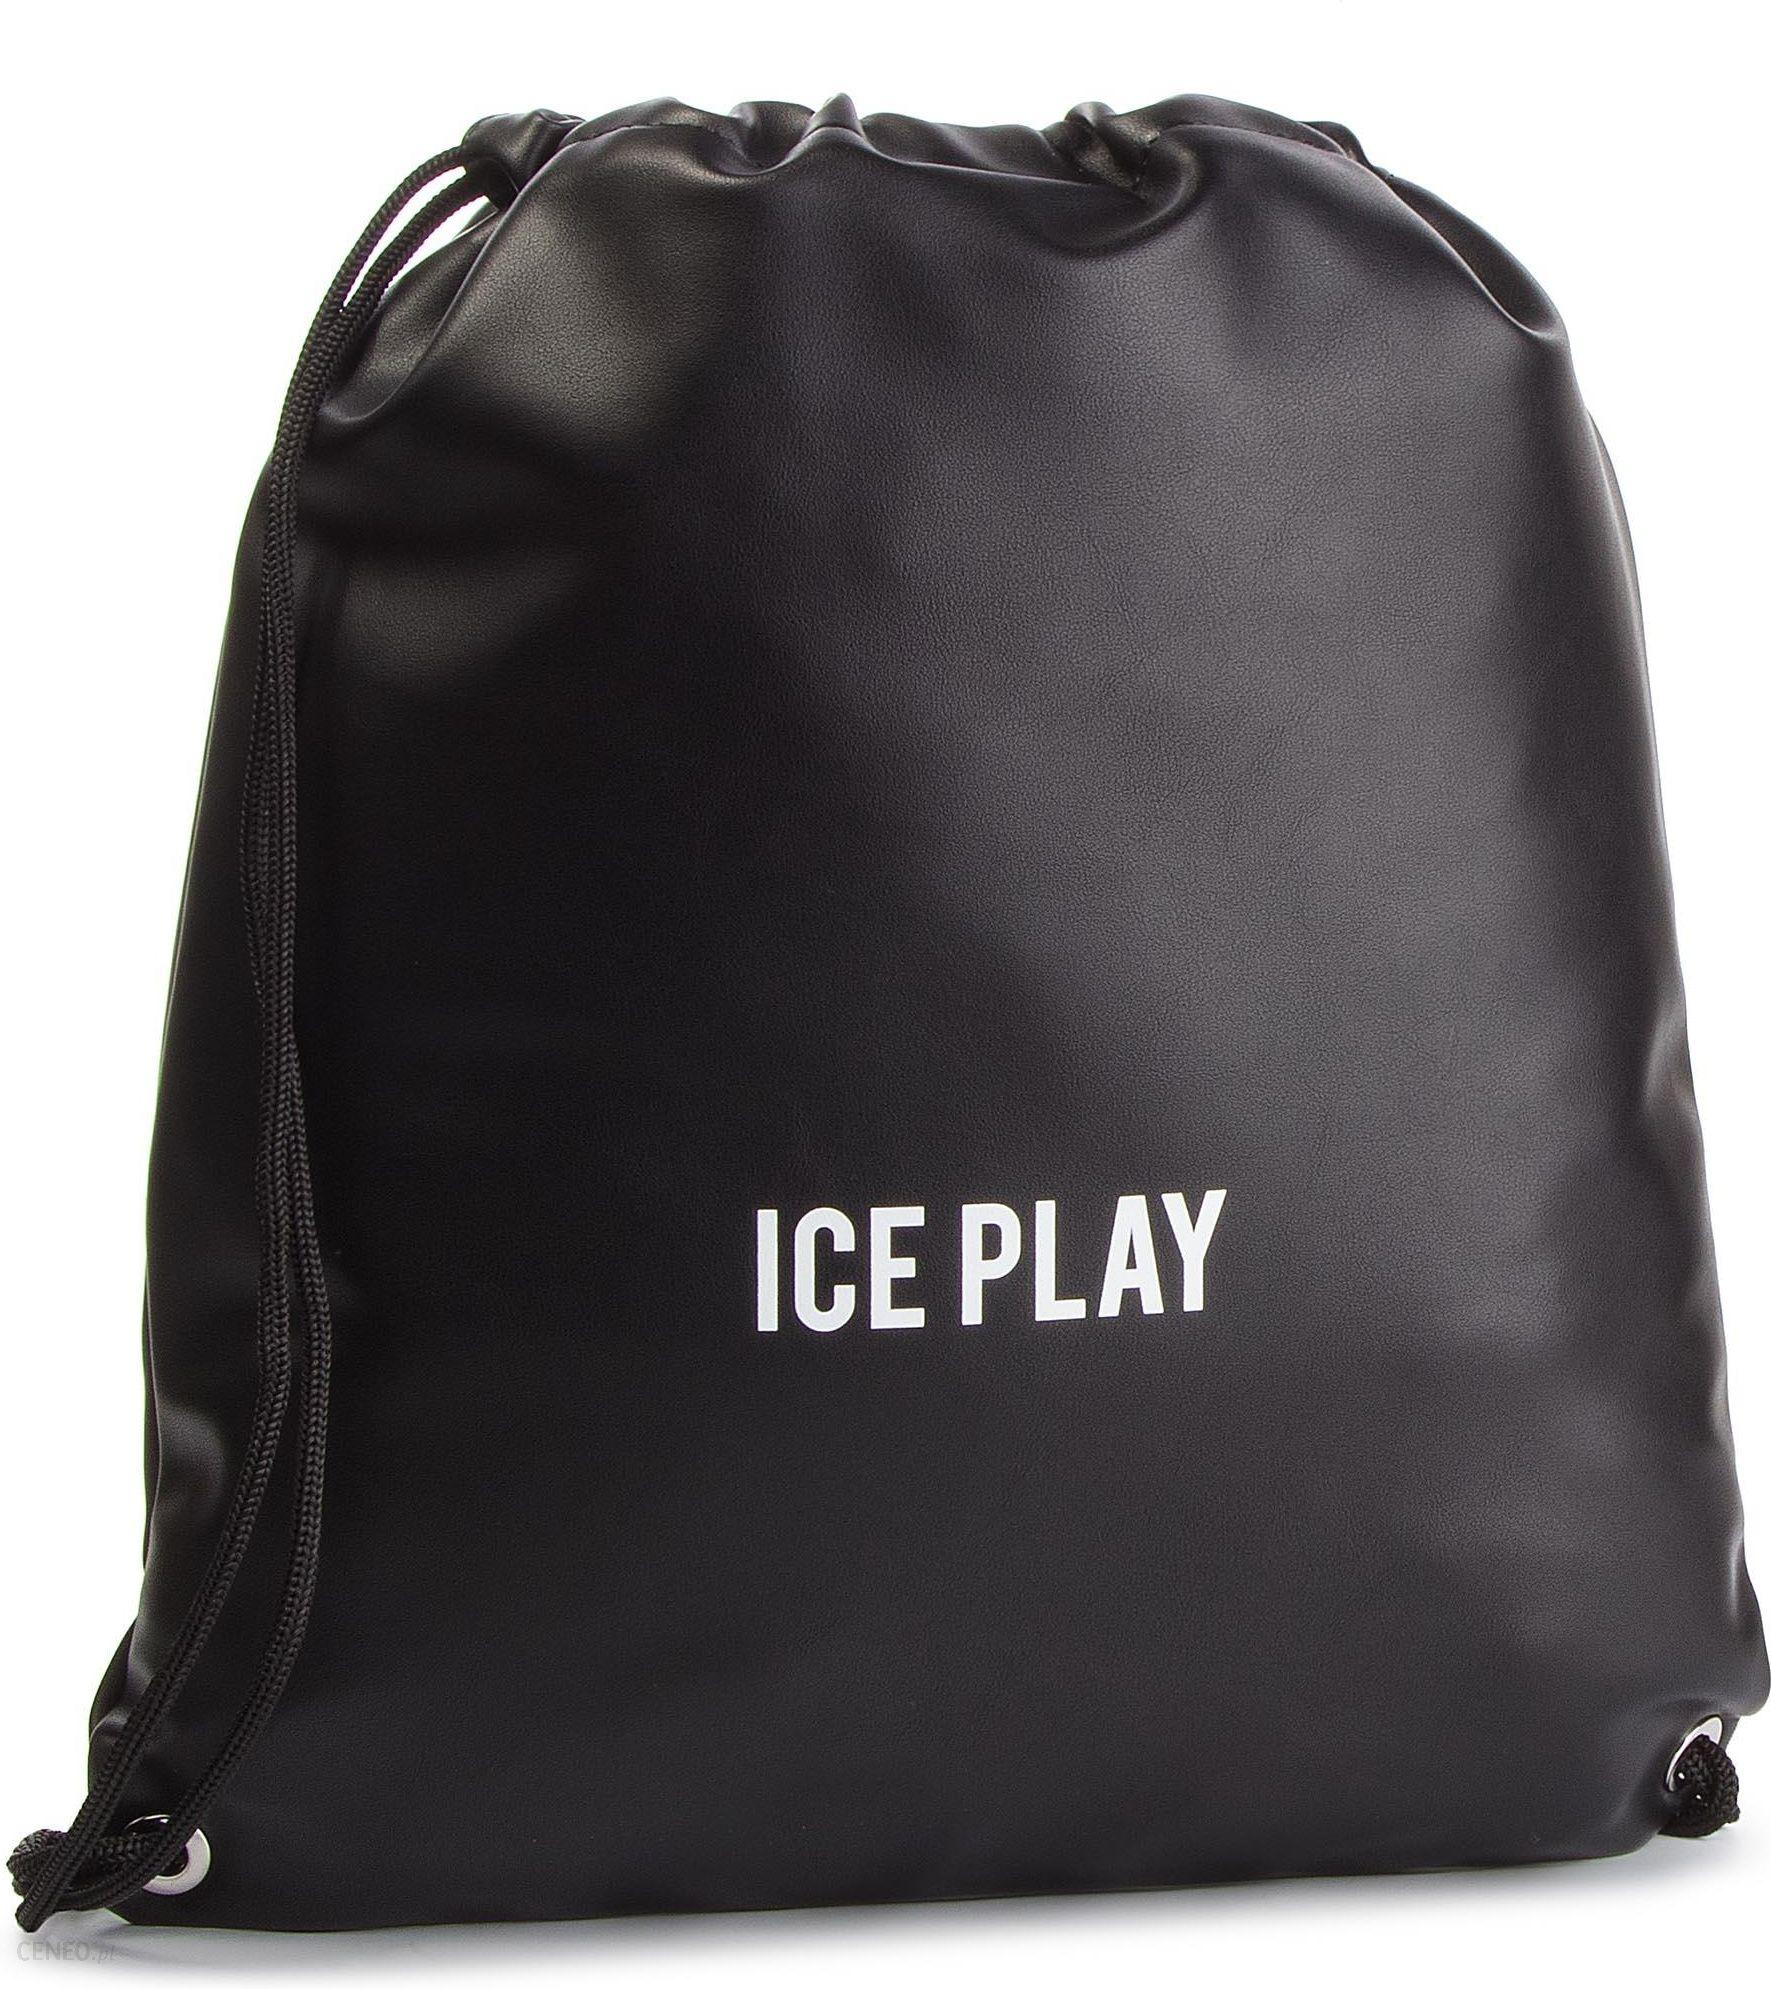 c34265e8b522b Plecak ICE PLAY - 19E W2M1 7203 6928 9000 Black - Ceny i opinie ...